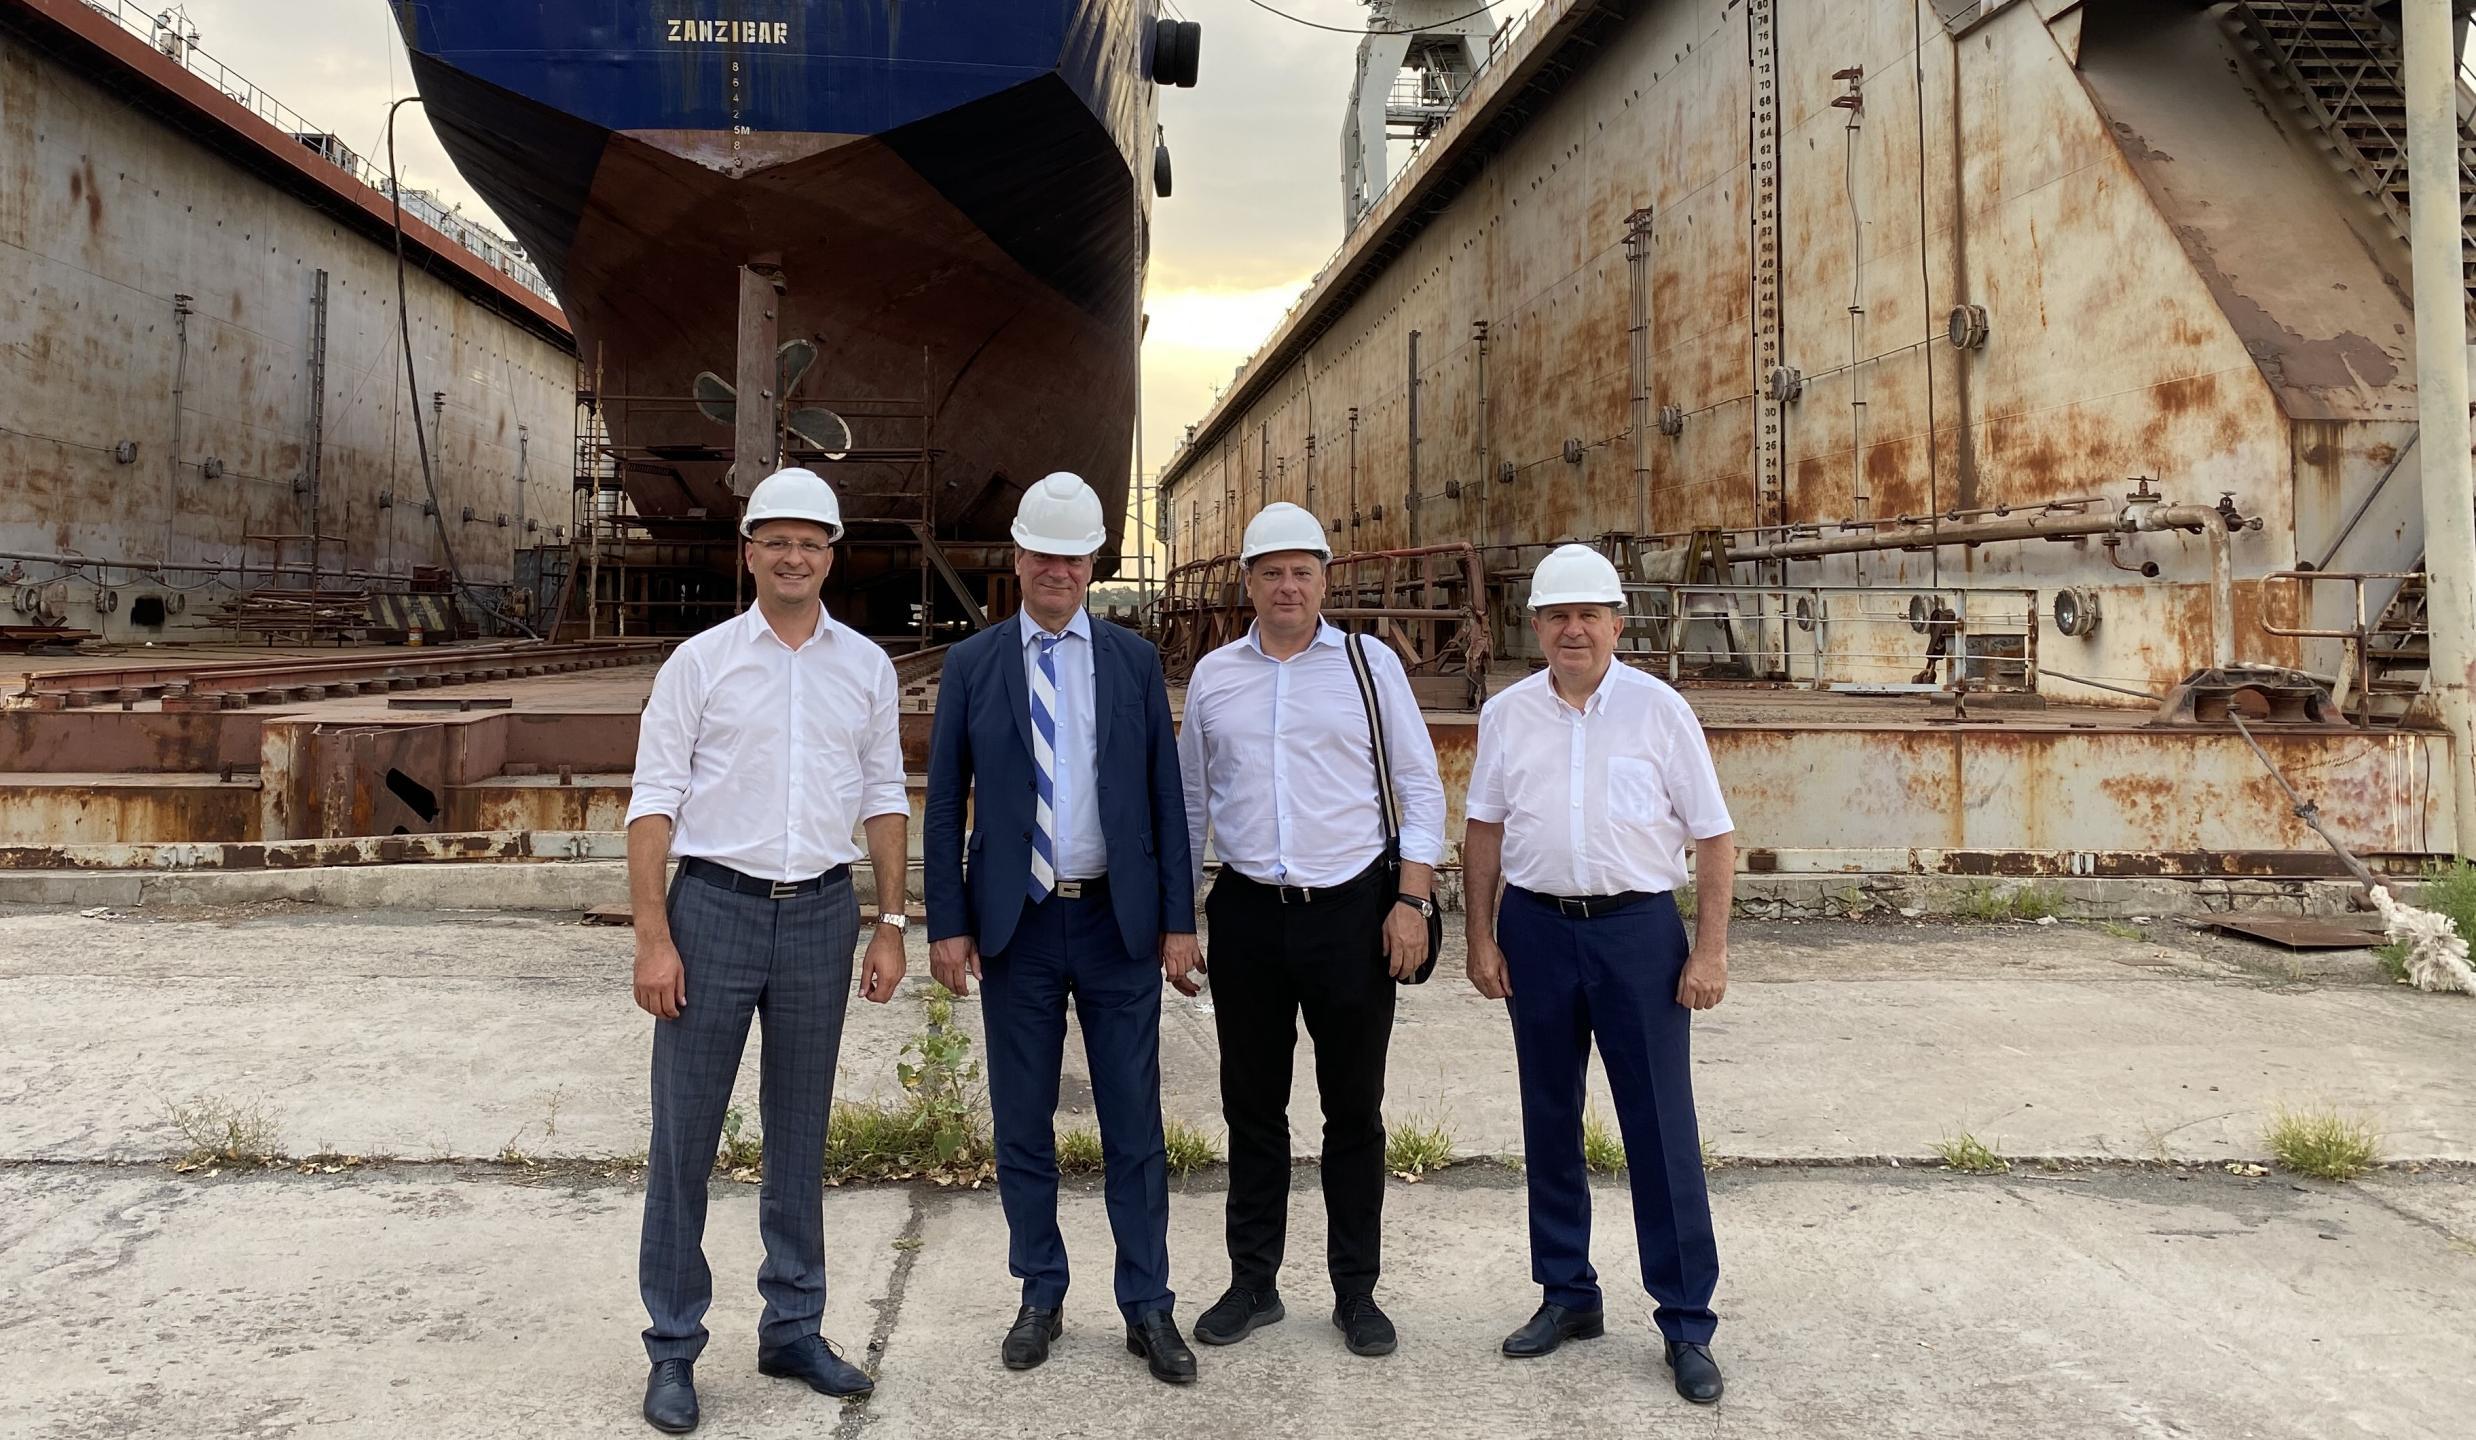 Minister of Strategic Industries of Ukraine, Oleg Urus'kyi has visited the shipyard Ocean